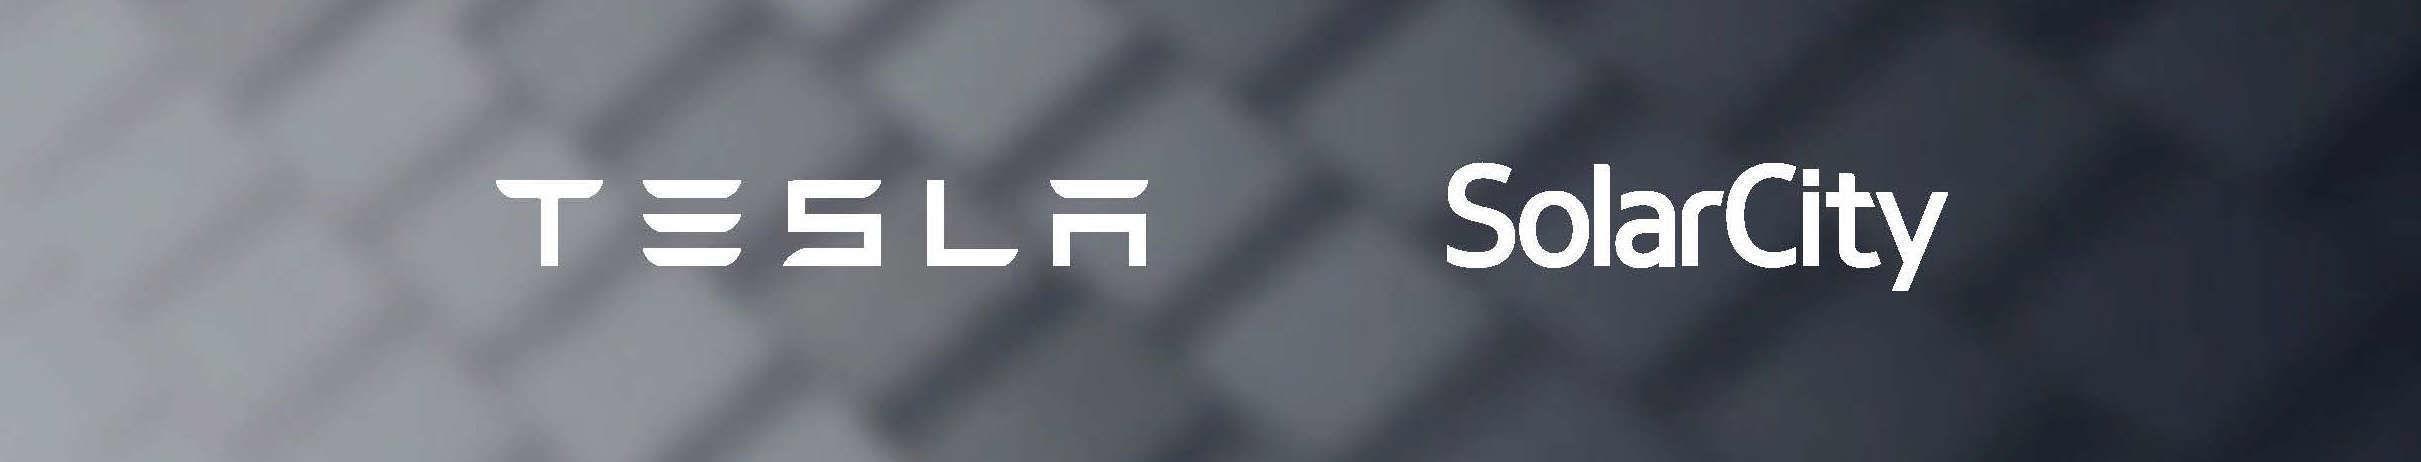 tesla_solarcity_header.jpg